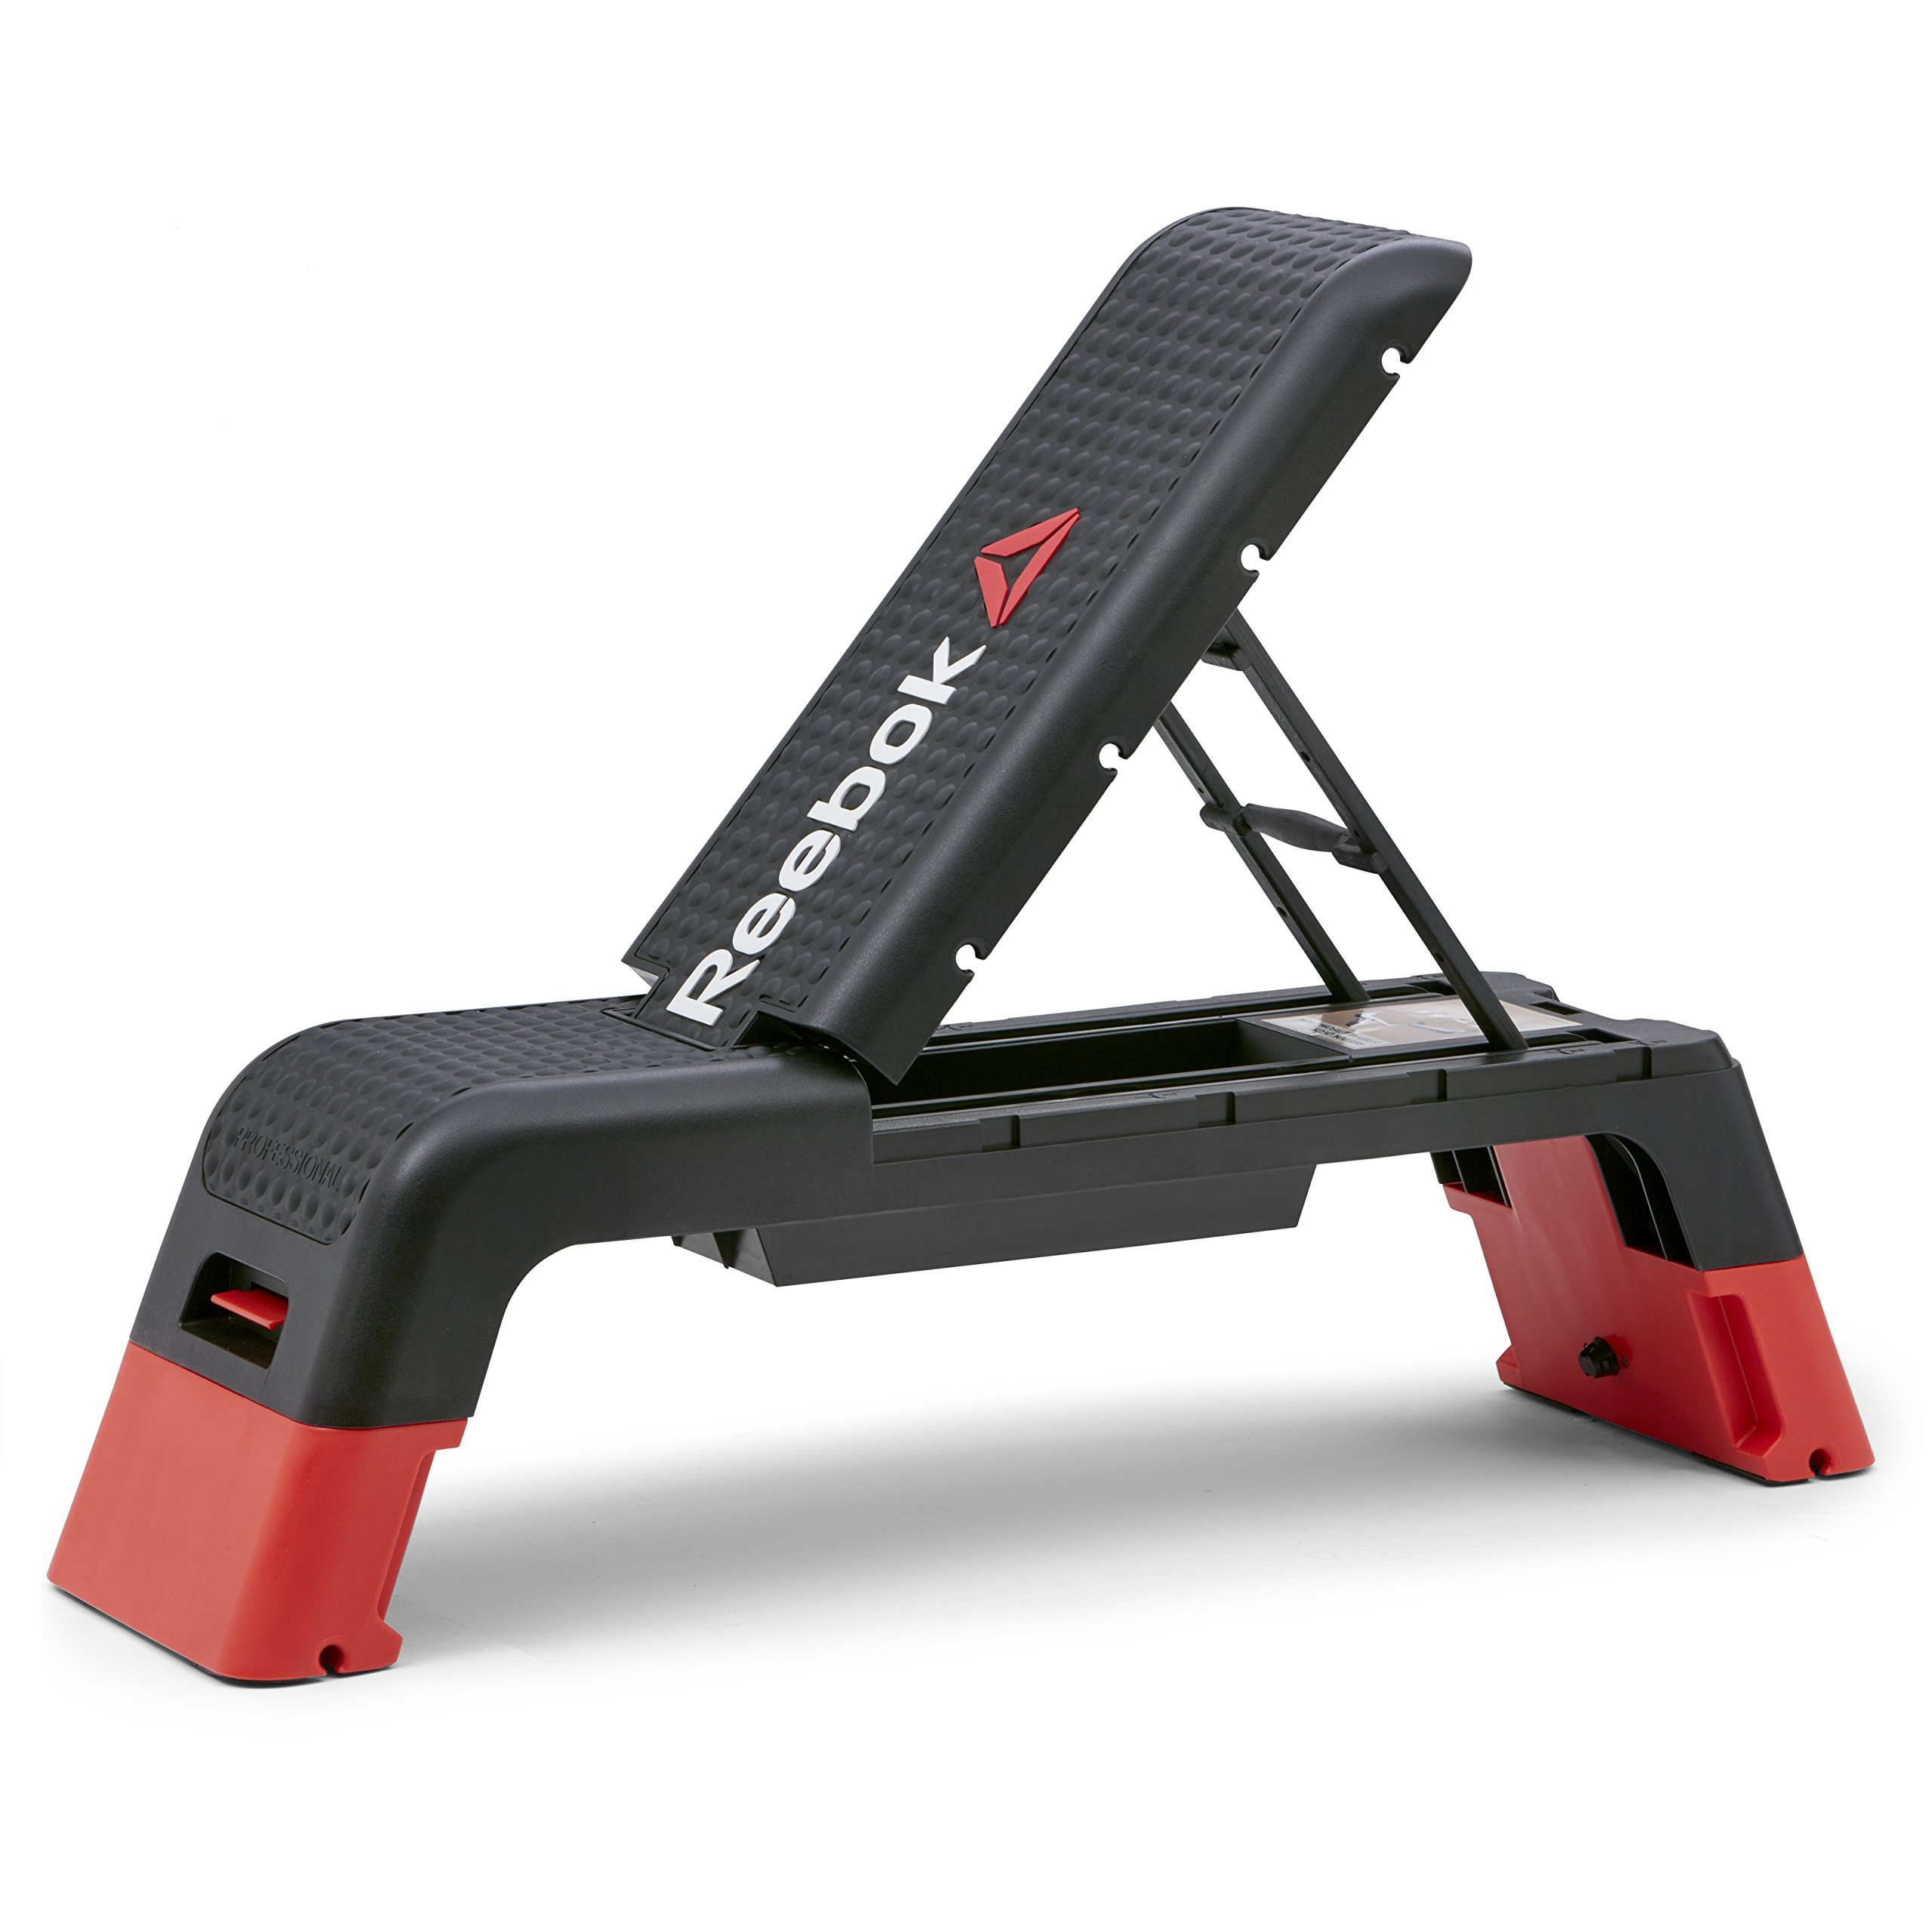 Reebok Professional Aerobic Deck Black